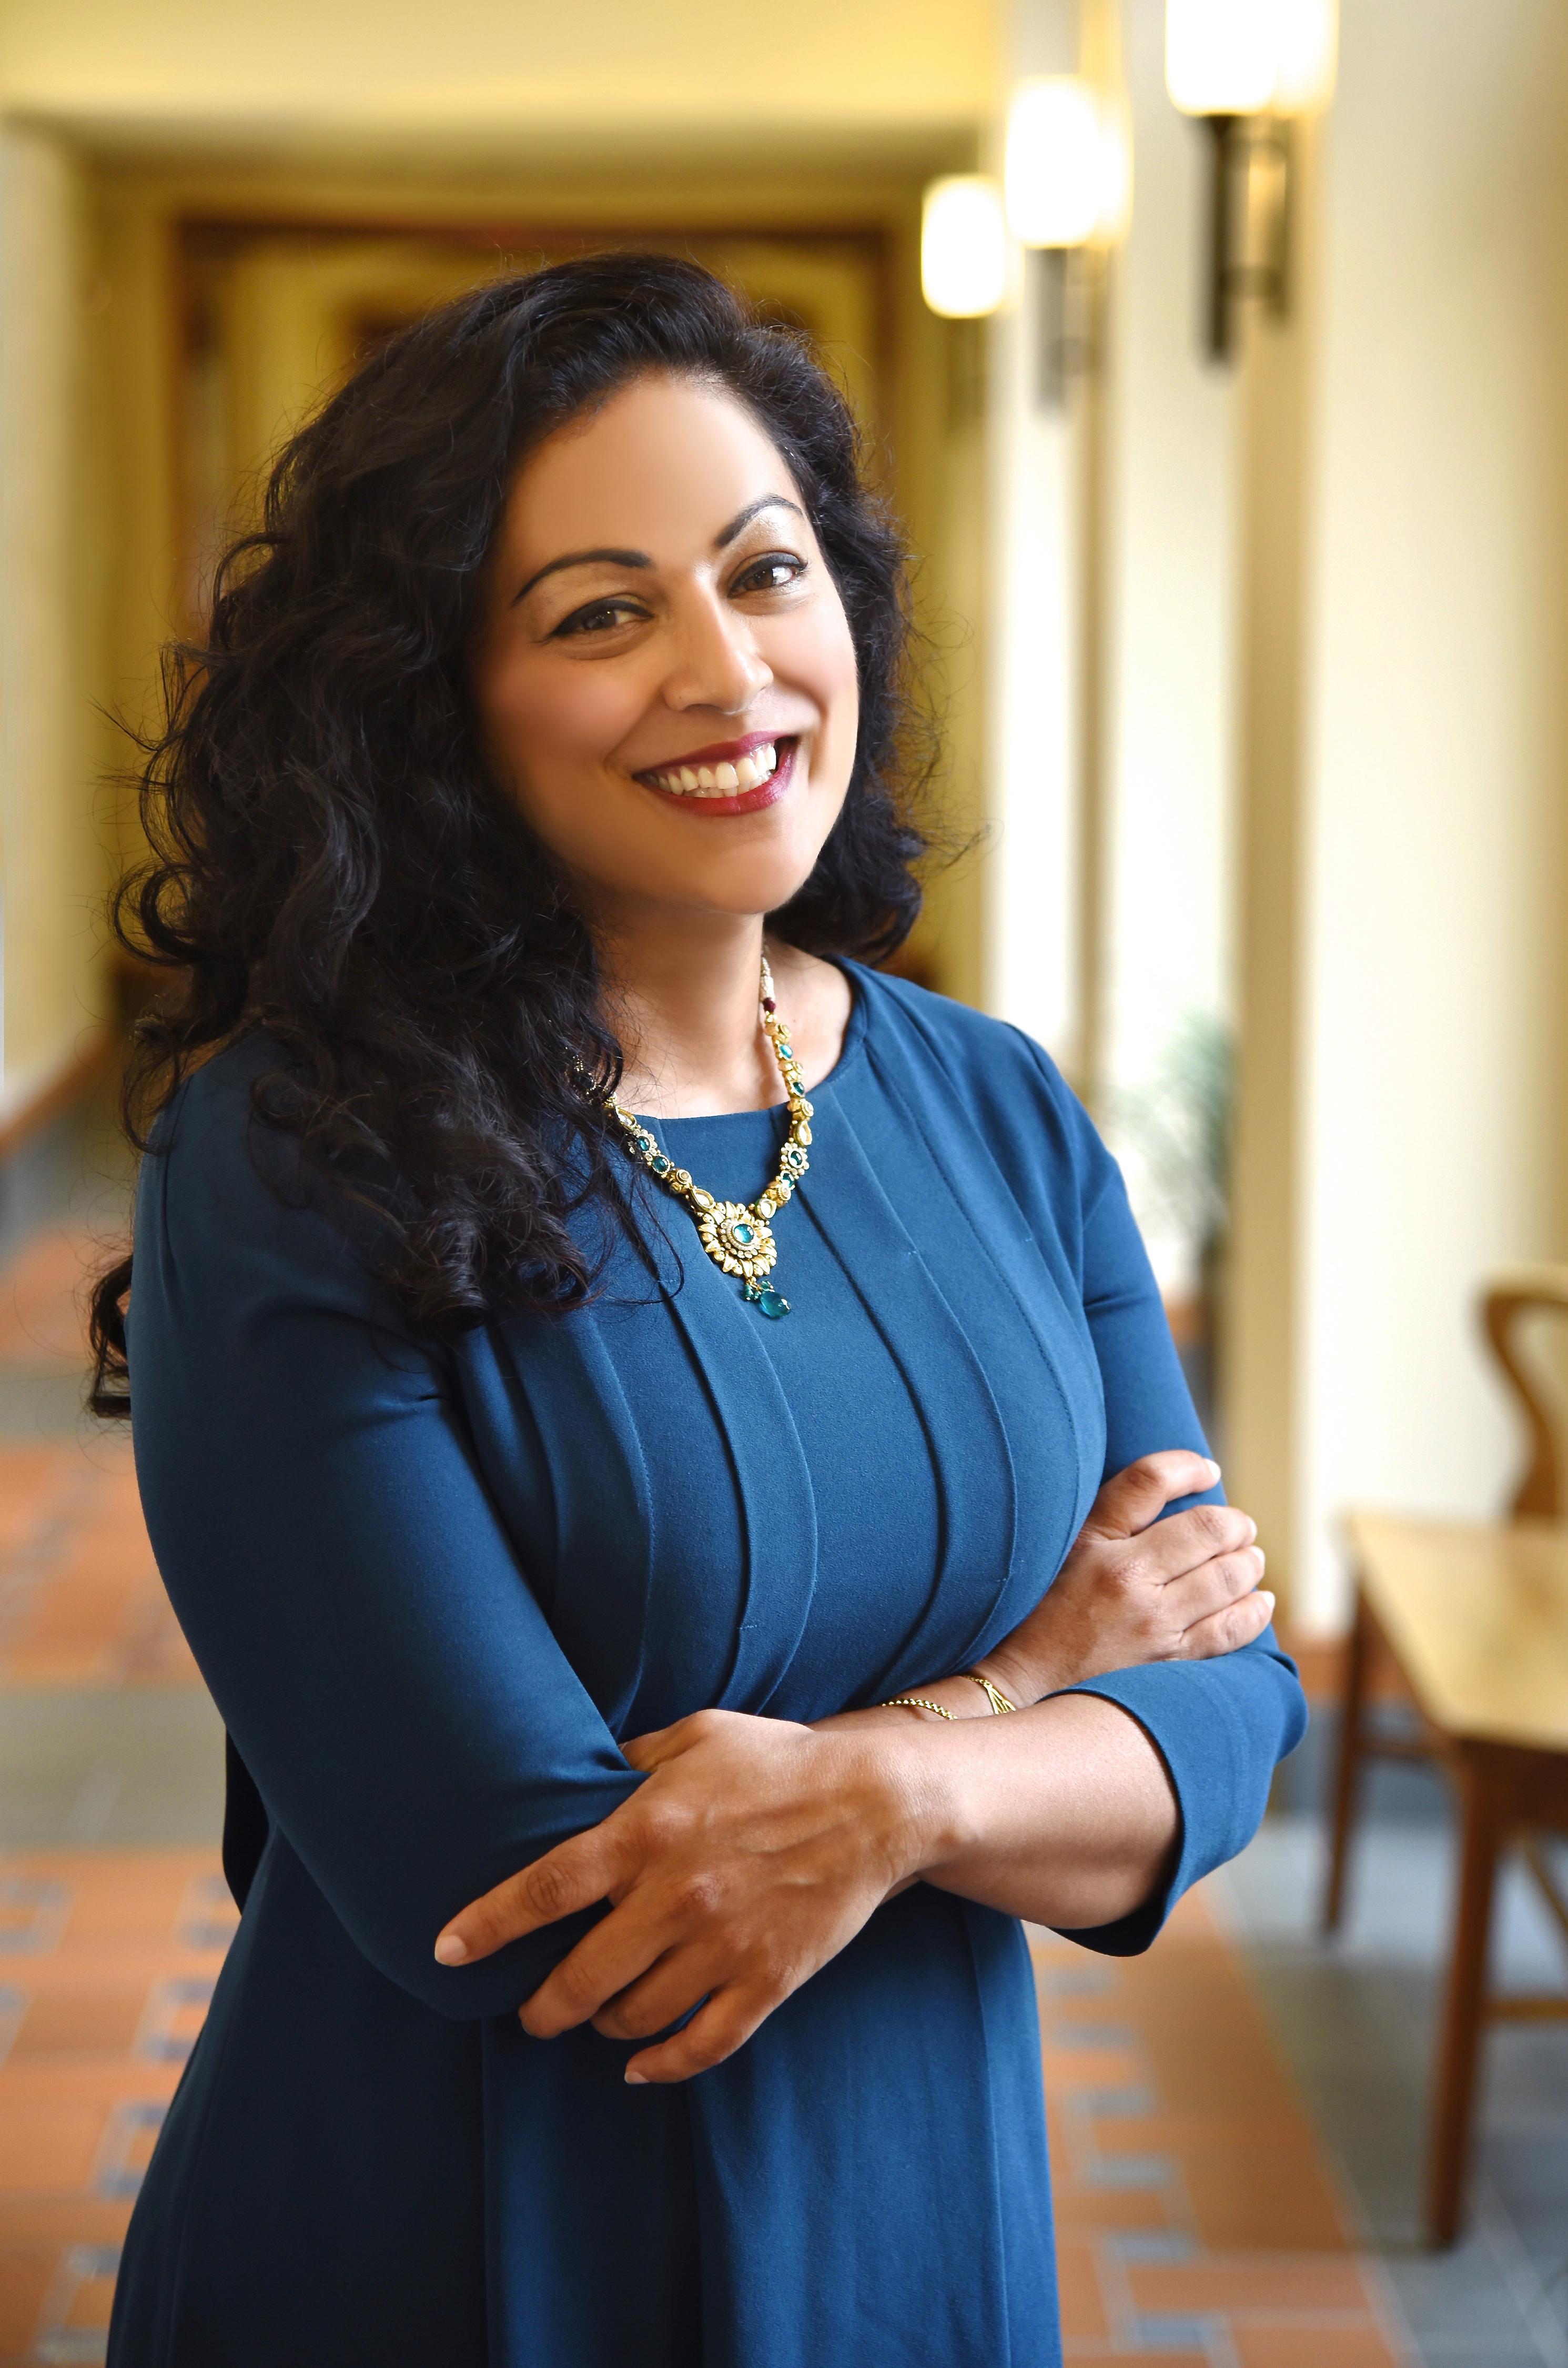 The Politics of Innovation in International Development: The Case of Menstrual Hygiene Management in India - Shobita Parthasarathy, University of Michigan